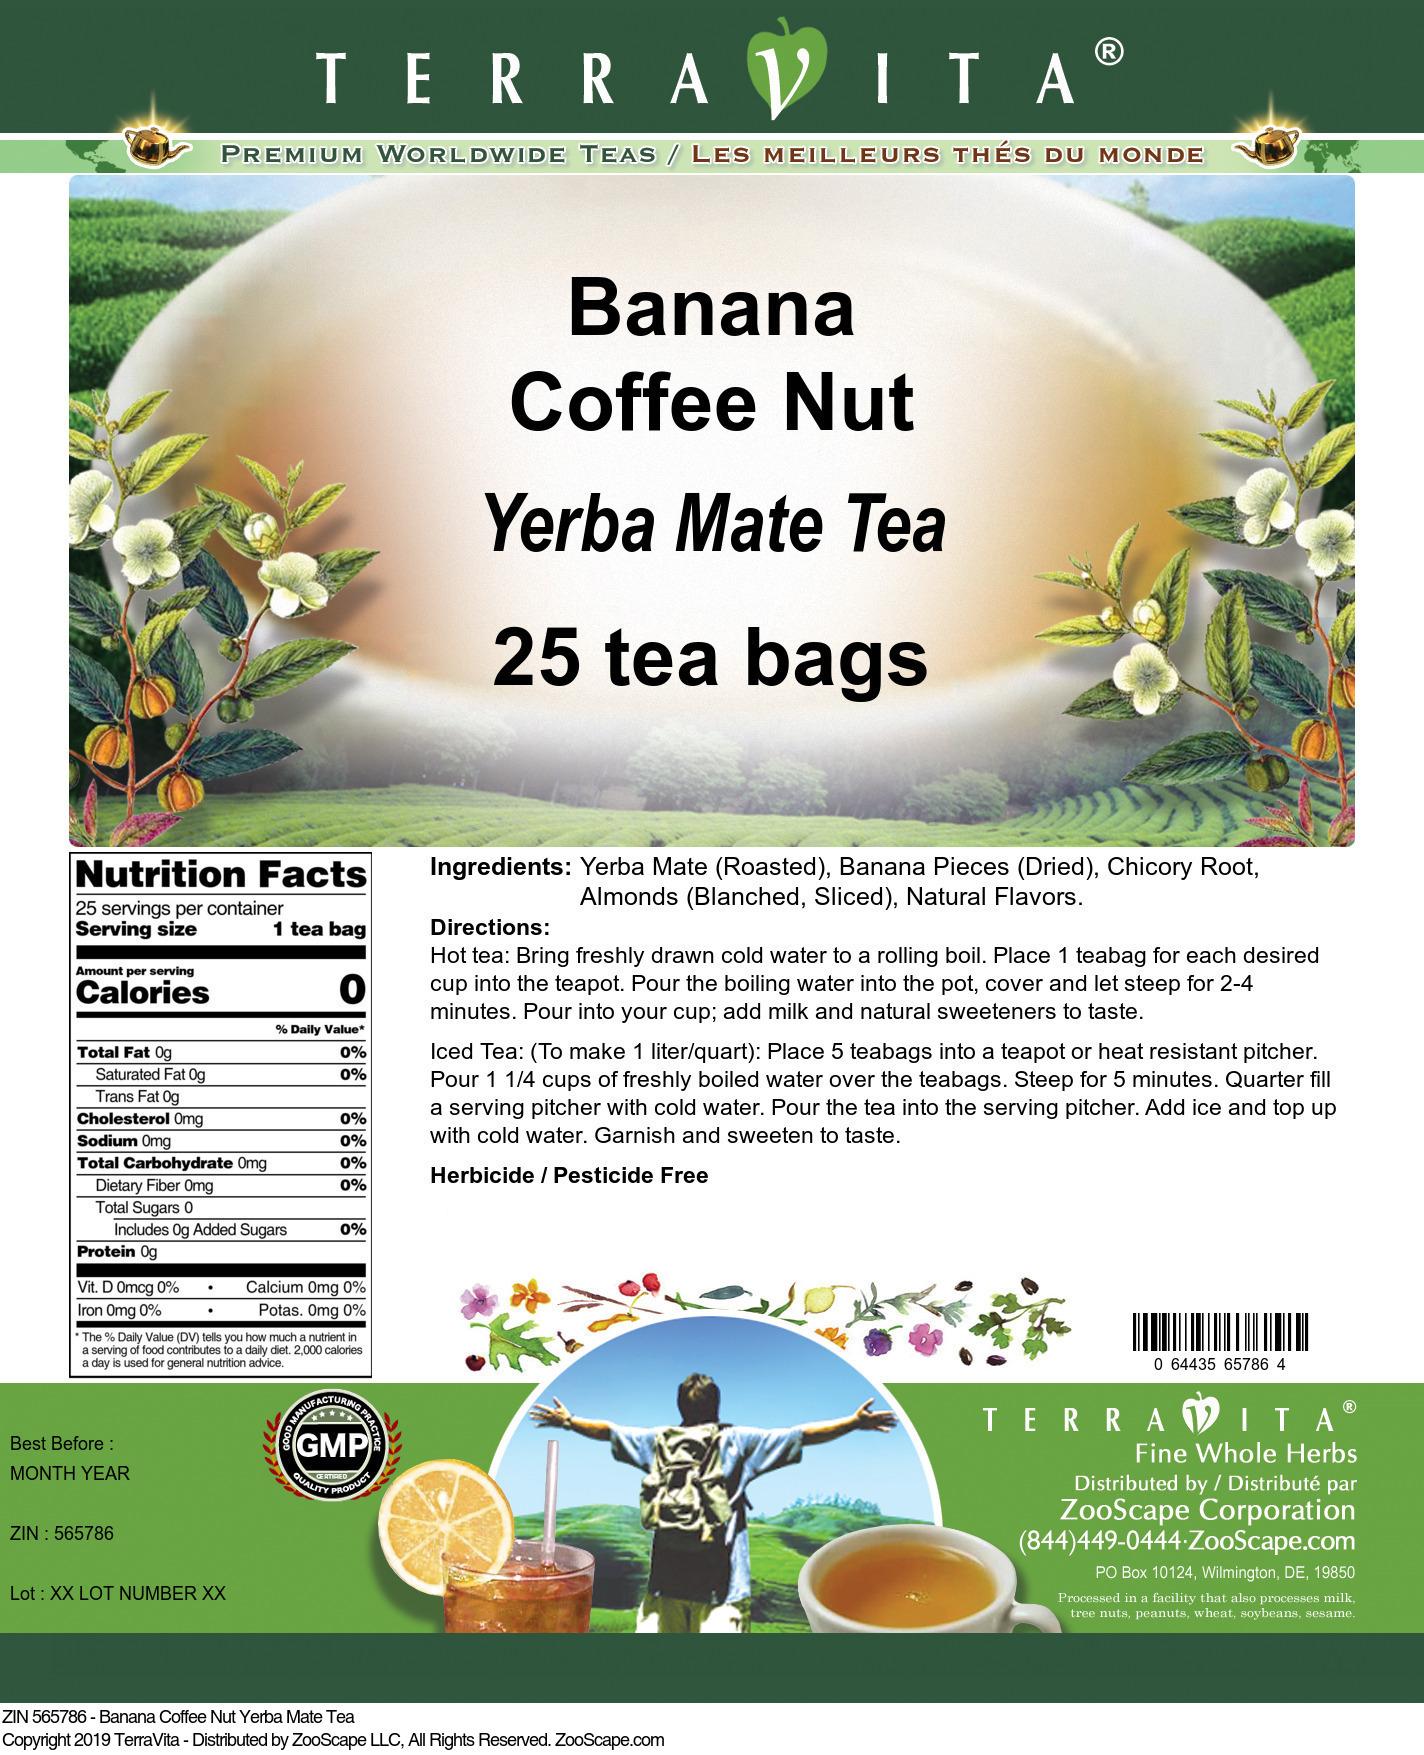 Banana Coffee Nut Yerba Mate